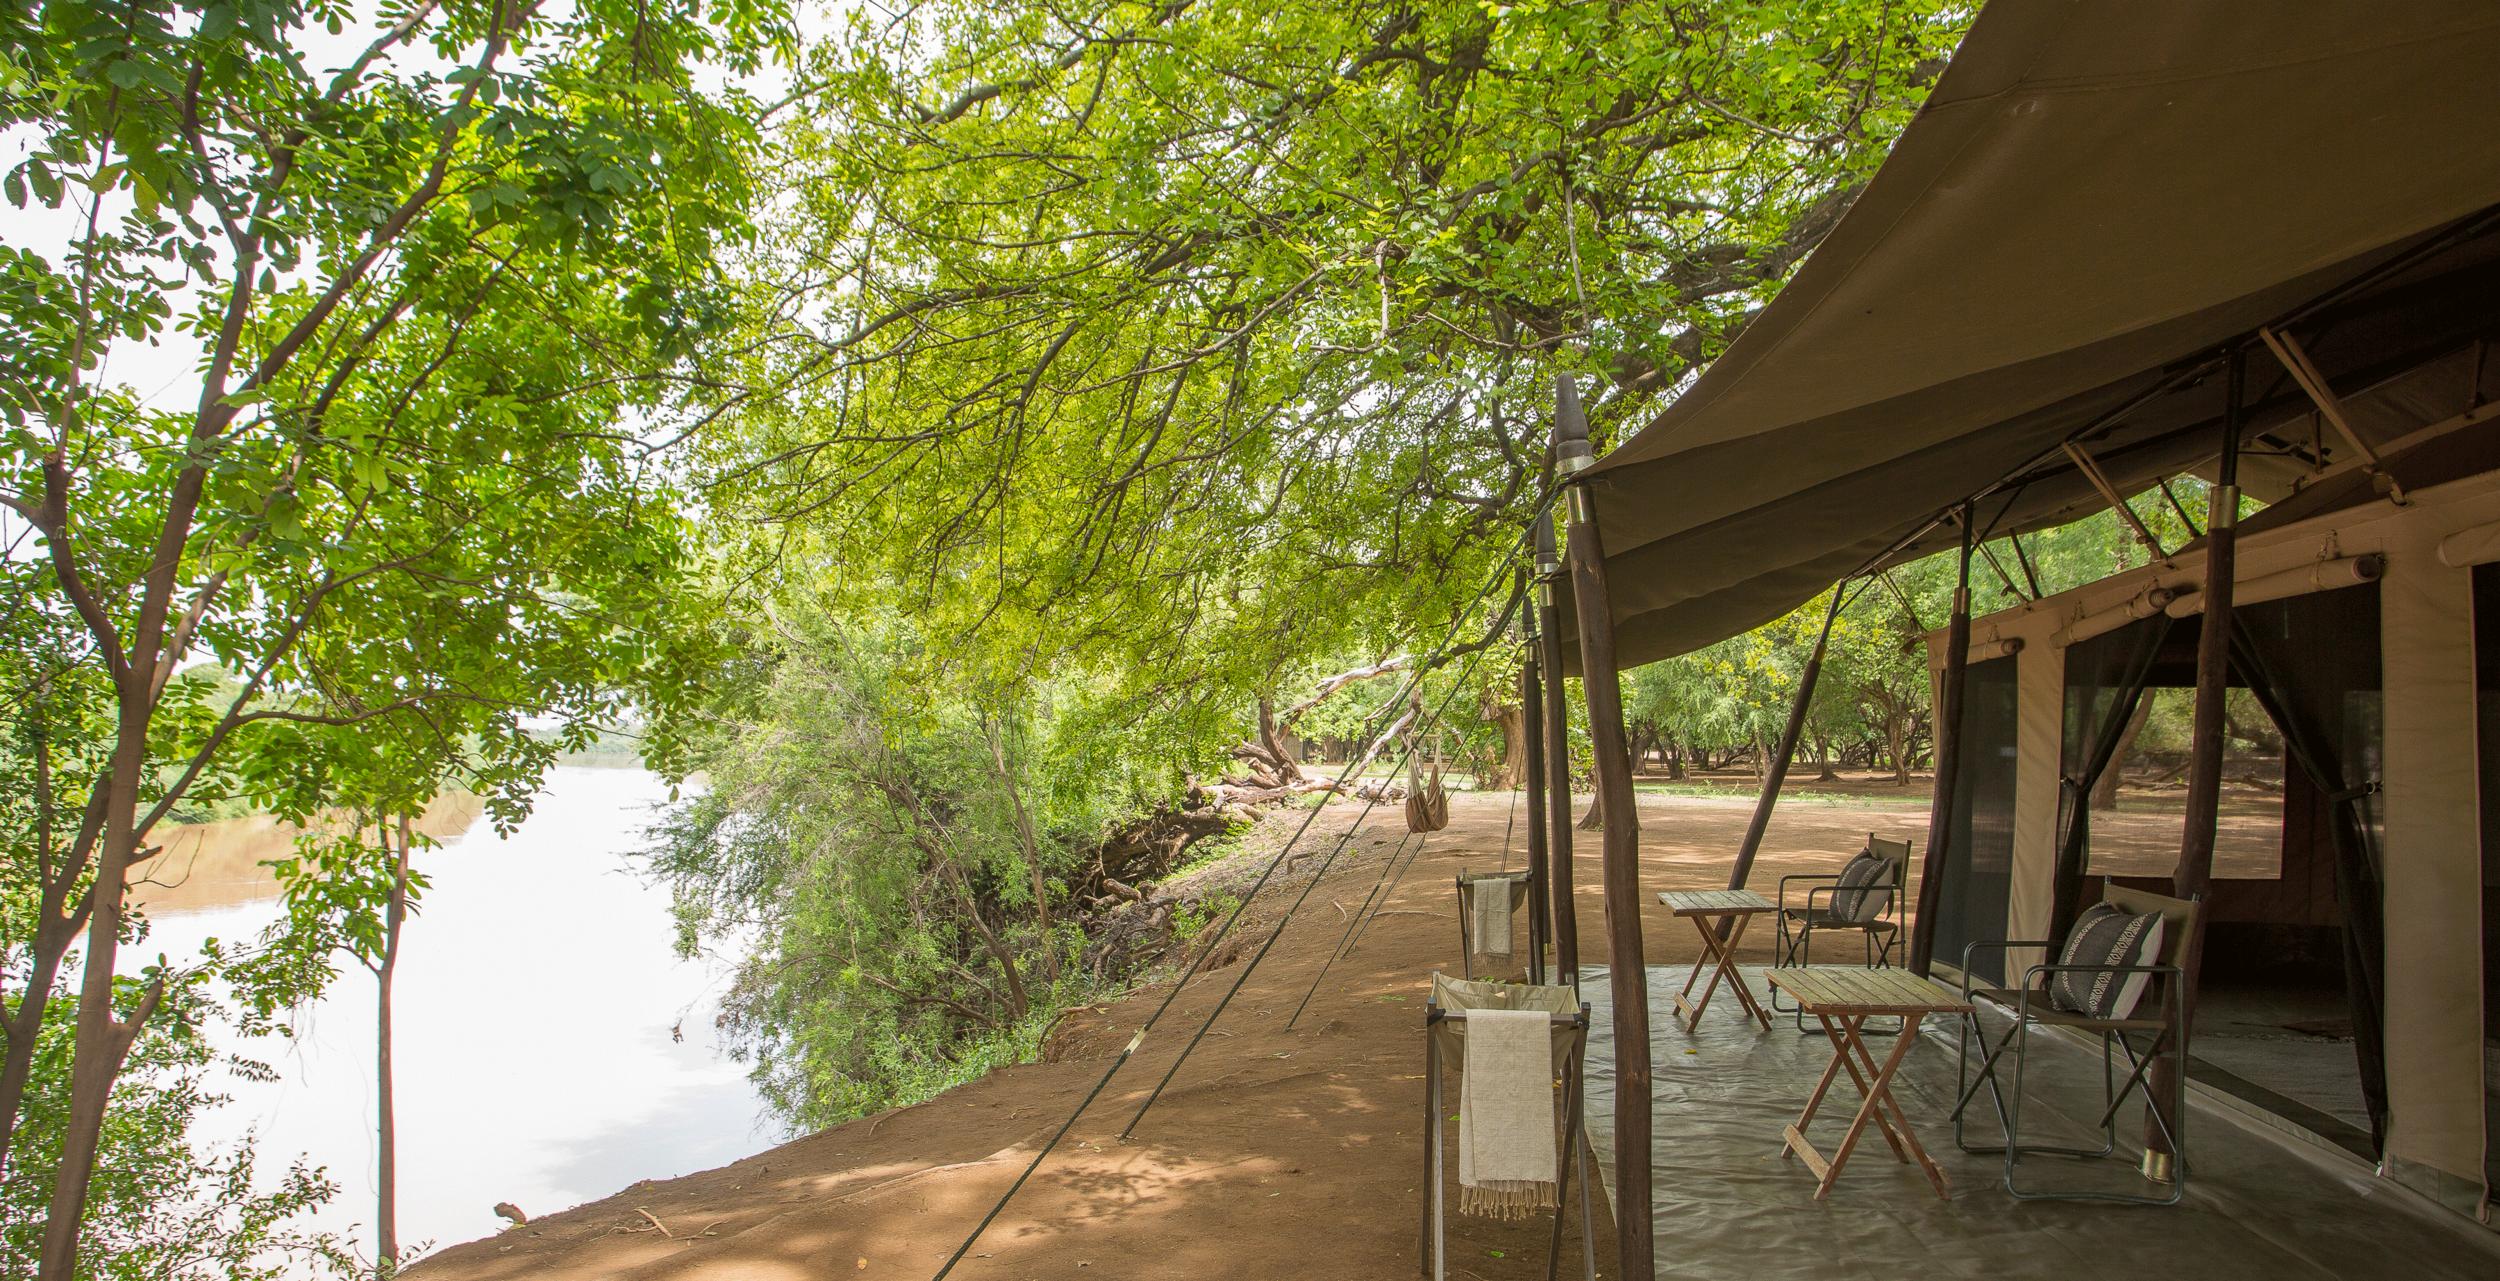 Lale's-Camp-Exterior-Omo-Ethiopia.png